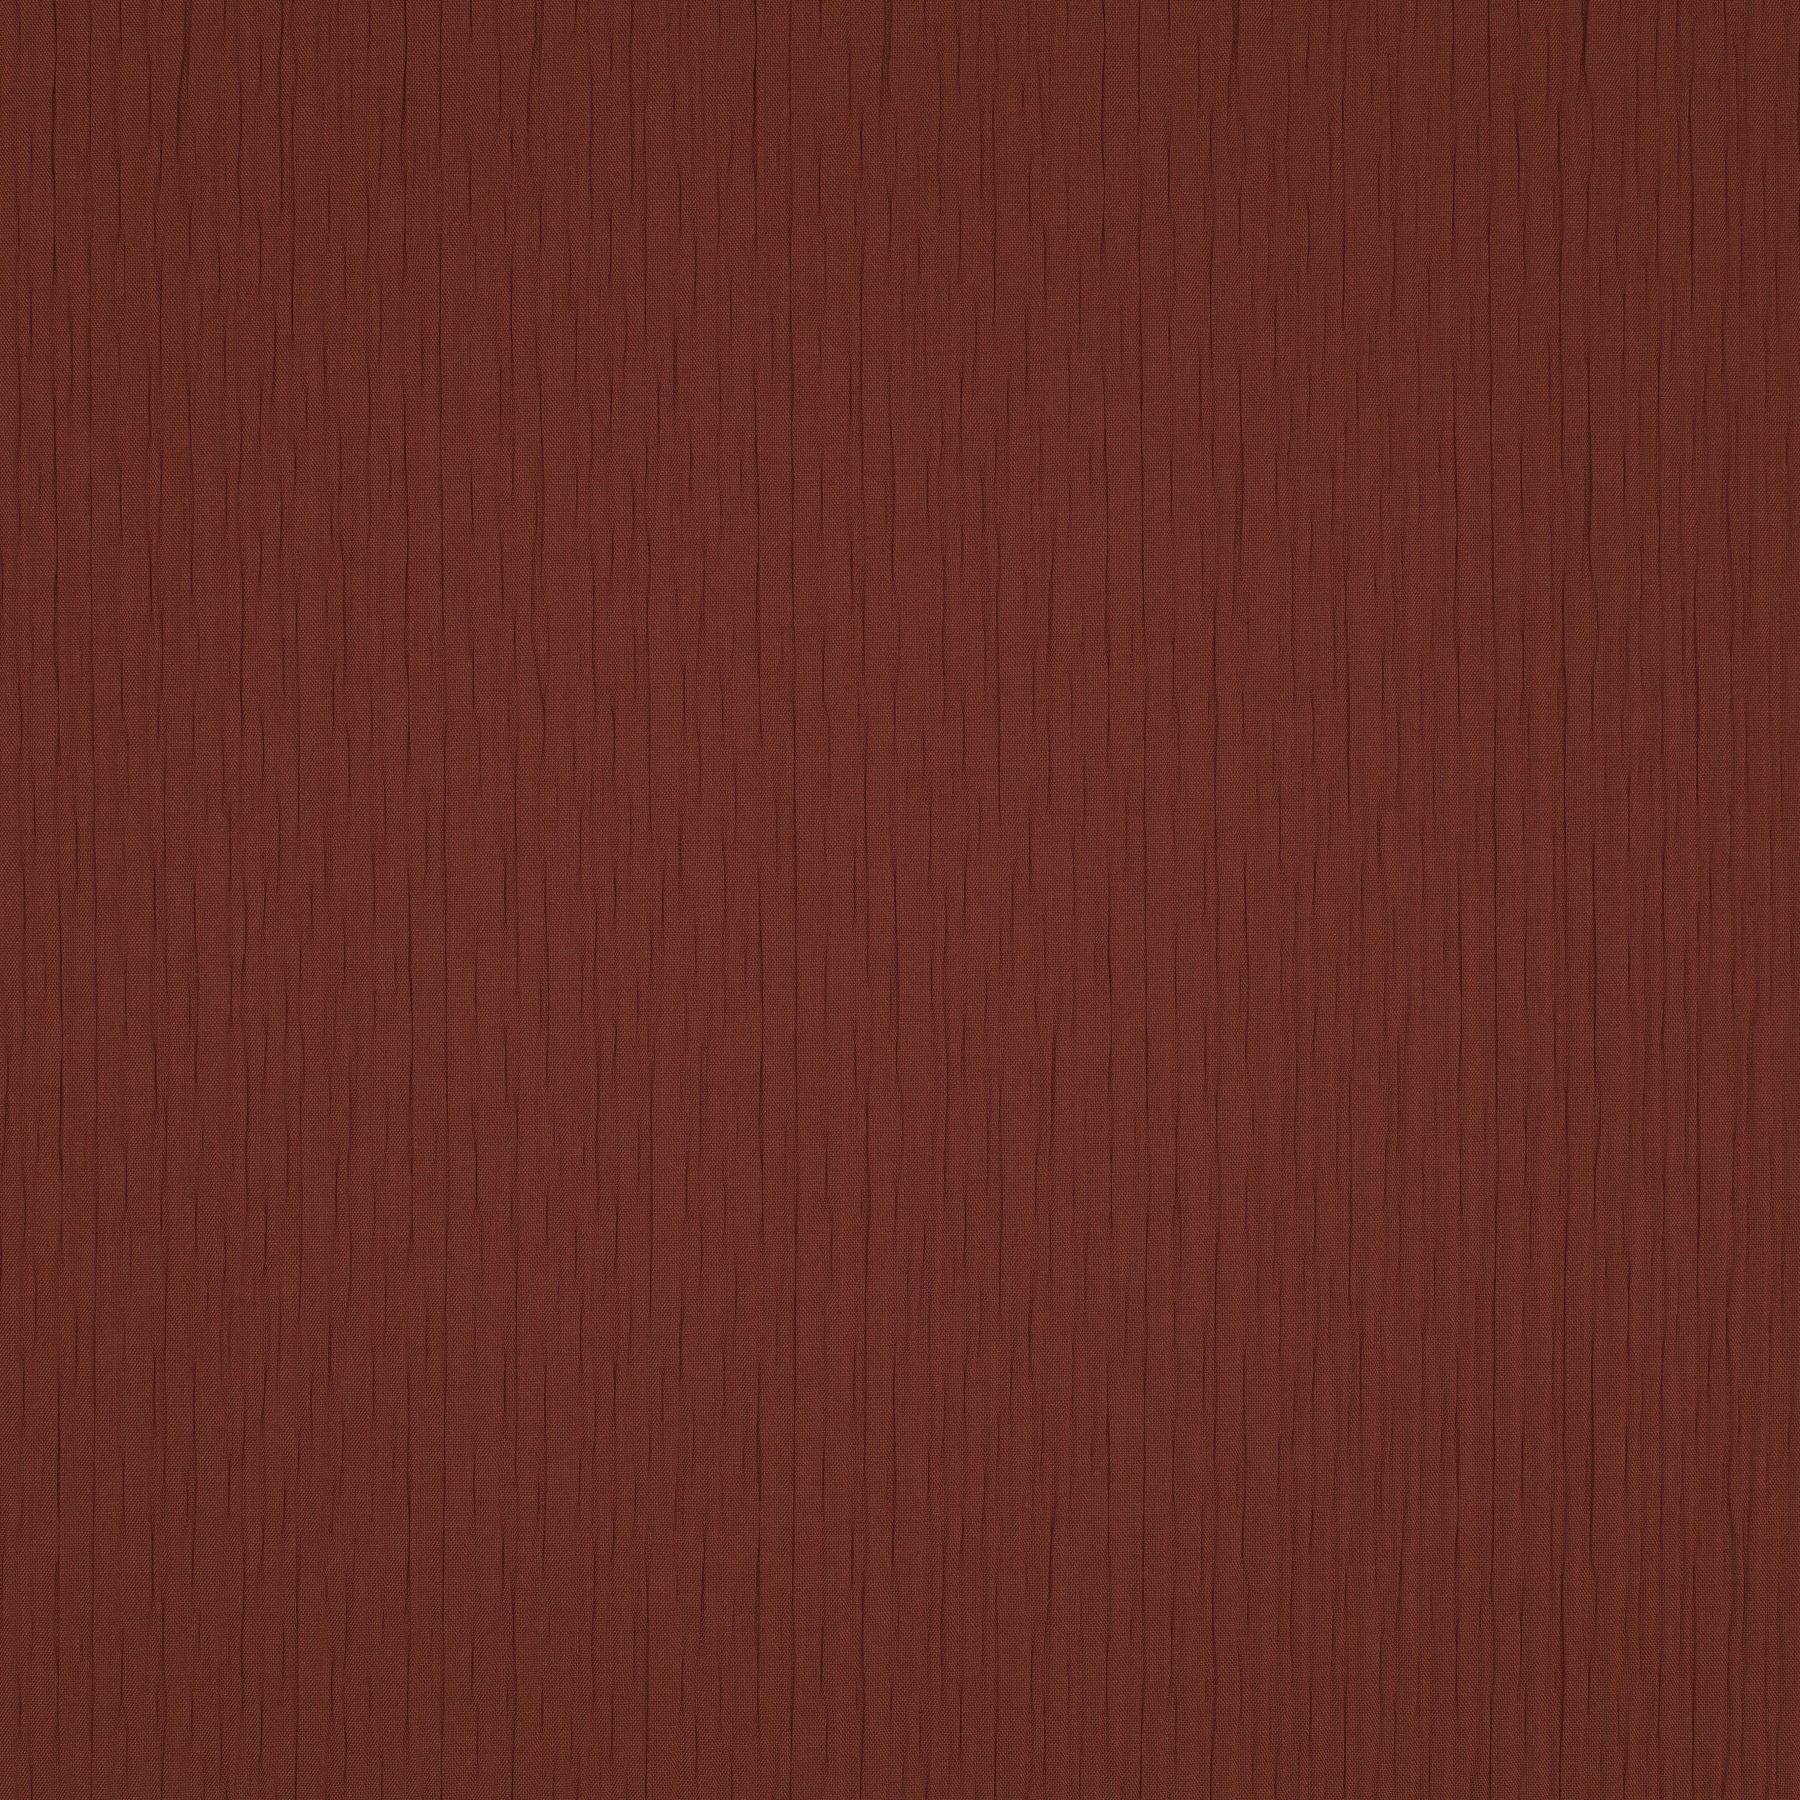 decoration fabric satin crash 1 6829 011 jab anstoetz. Black Bedroom Furniture Sets. Home Design Ideas